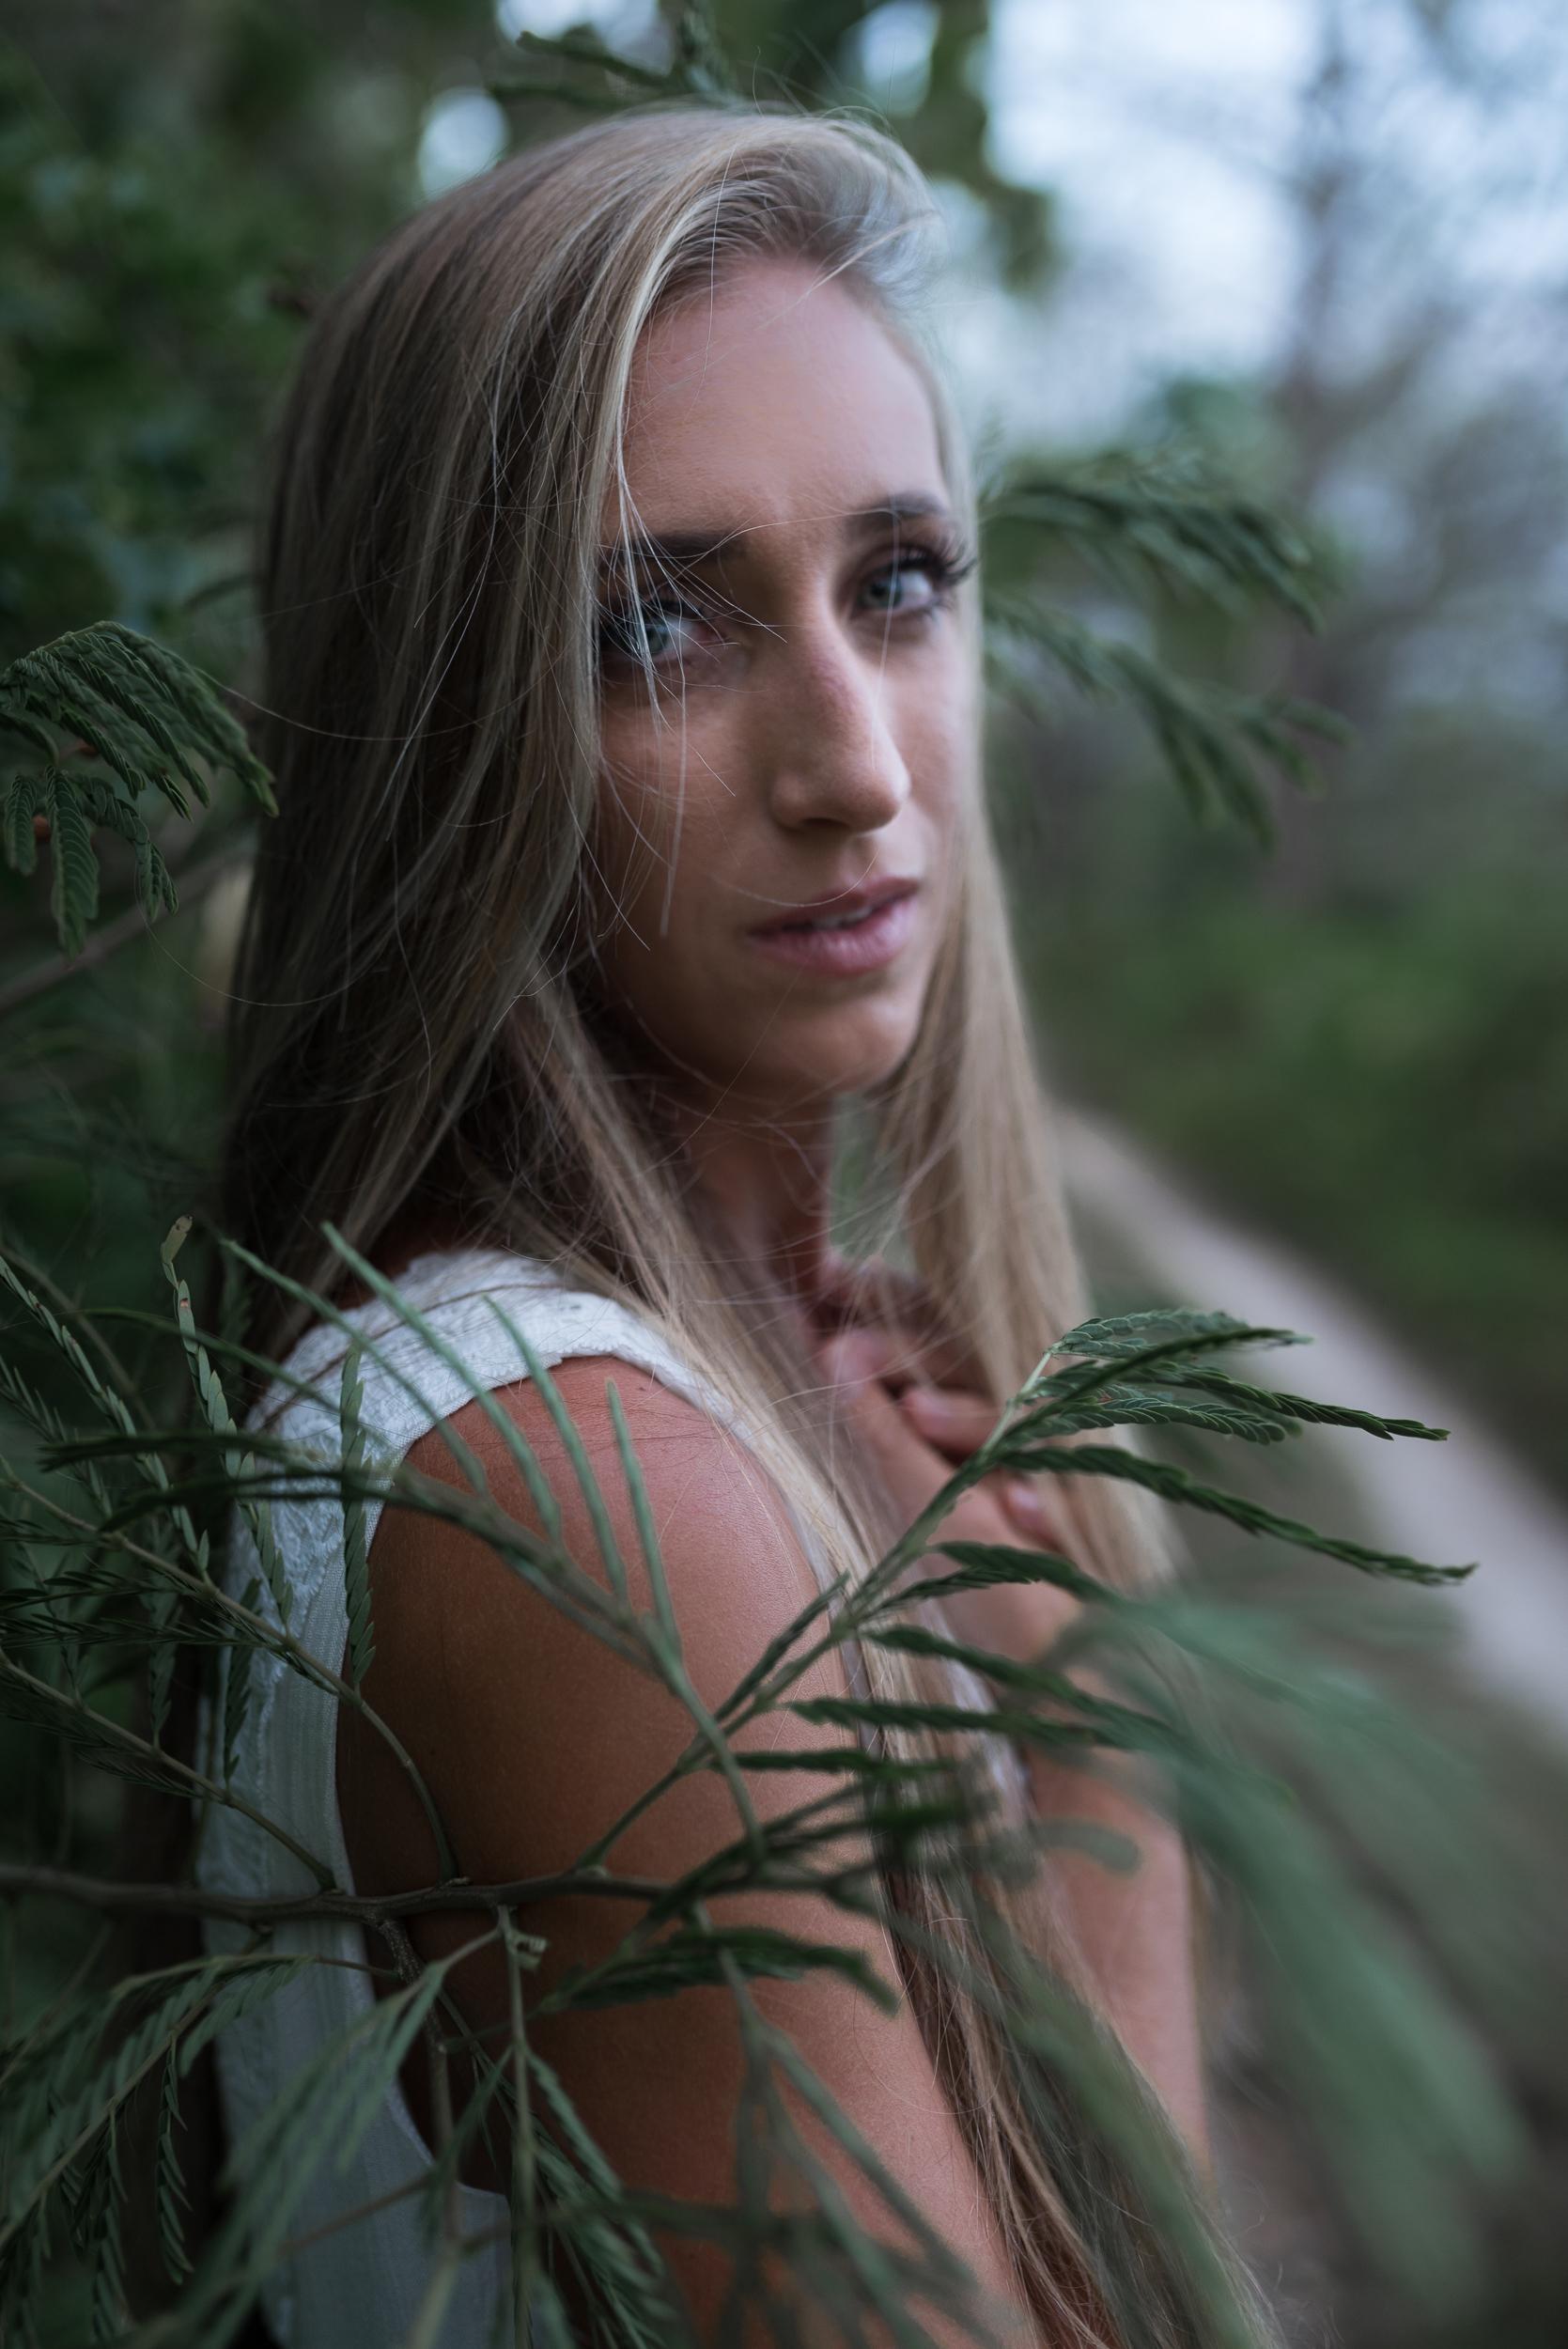 woman-guam-portrait-photographer-ipan-roxanne-augusta-11.jpg